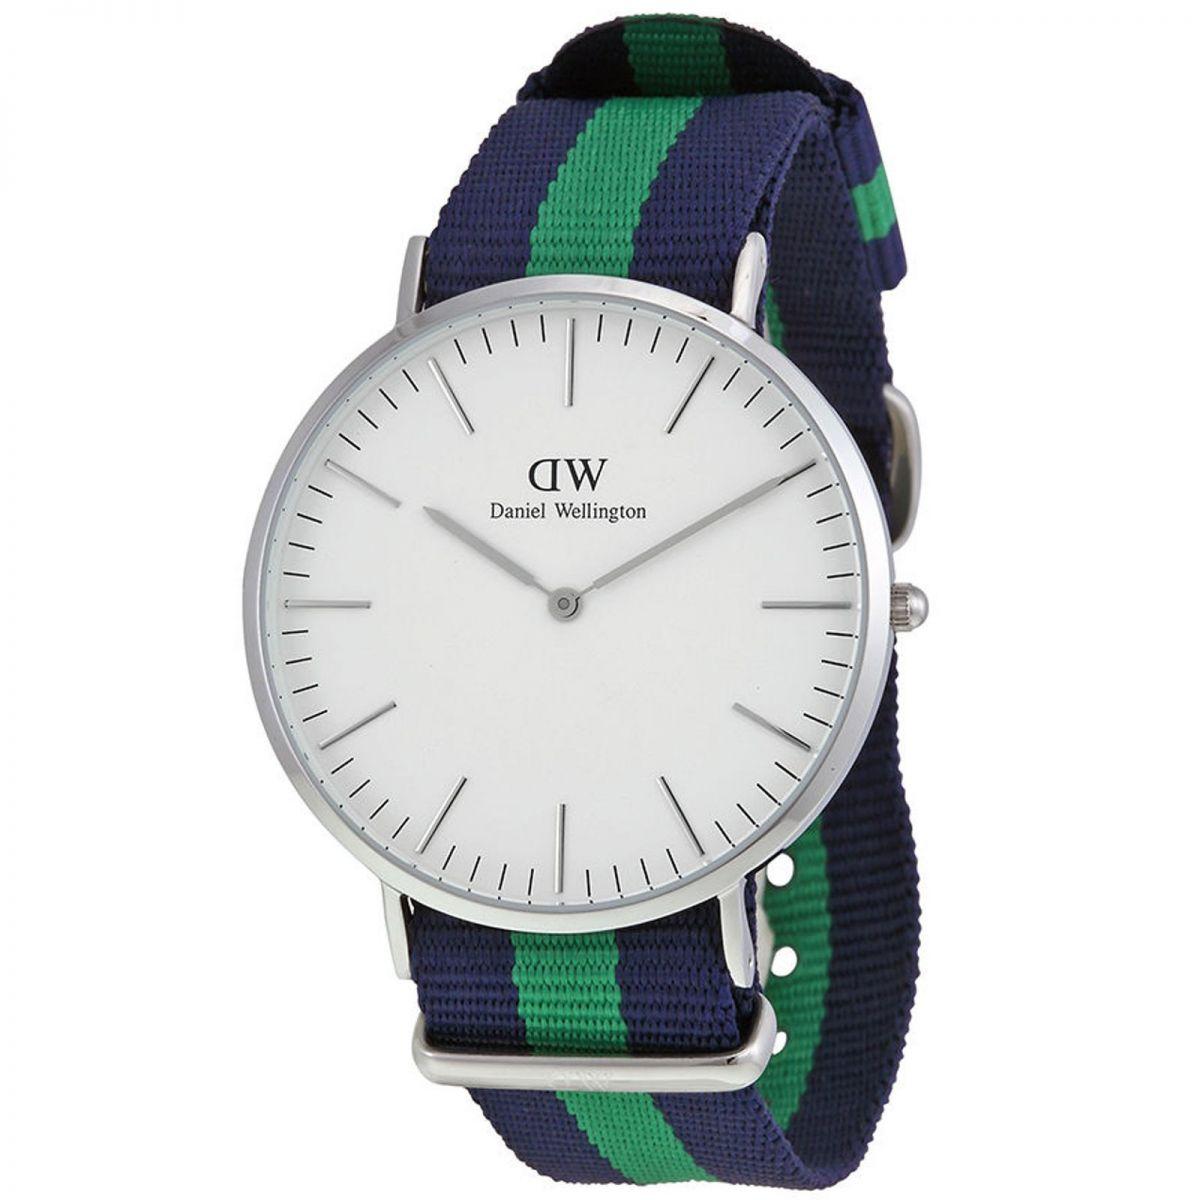 Orologio Daniel Wellington Classic Warwick 0205DW da Uomo